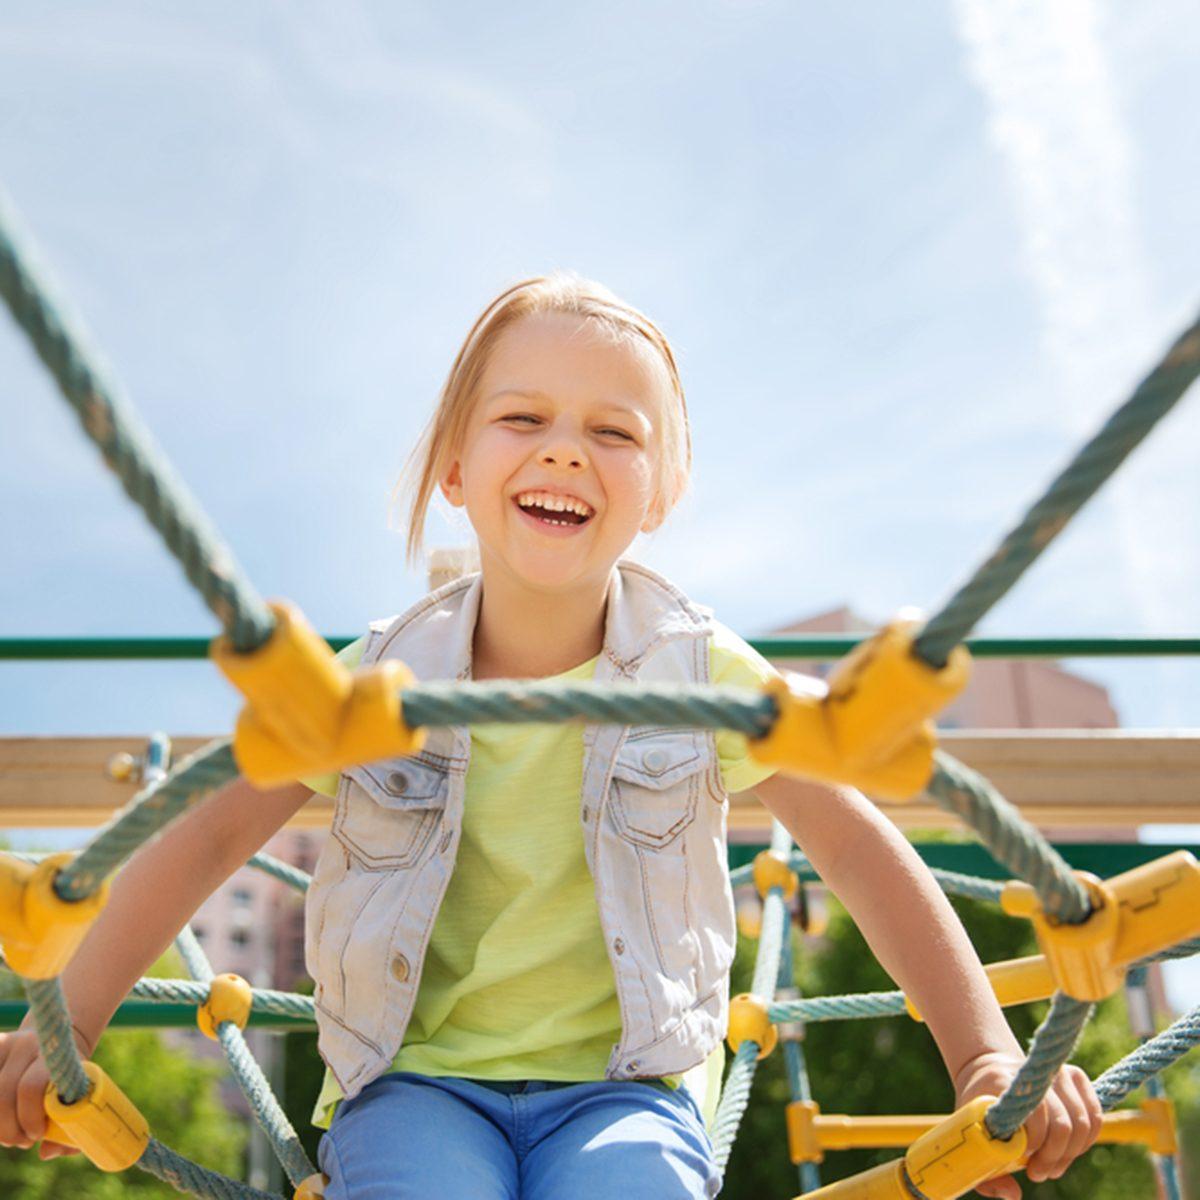 happy little girl on children playground climbing frame